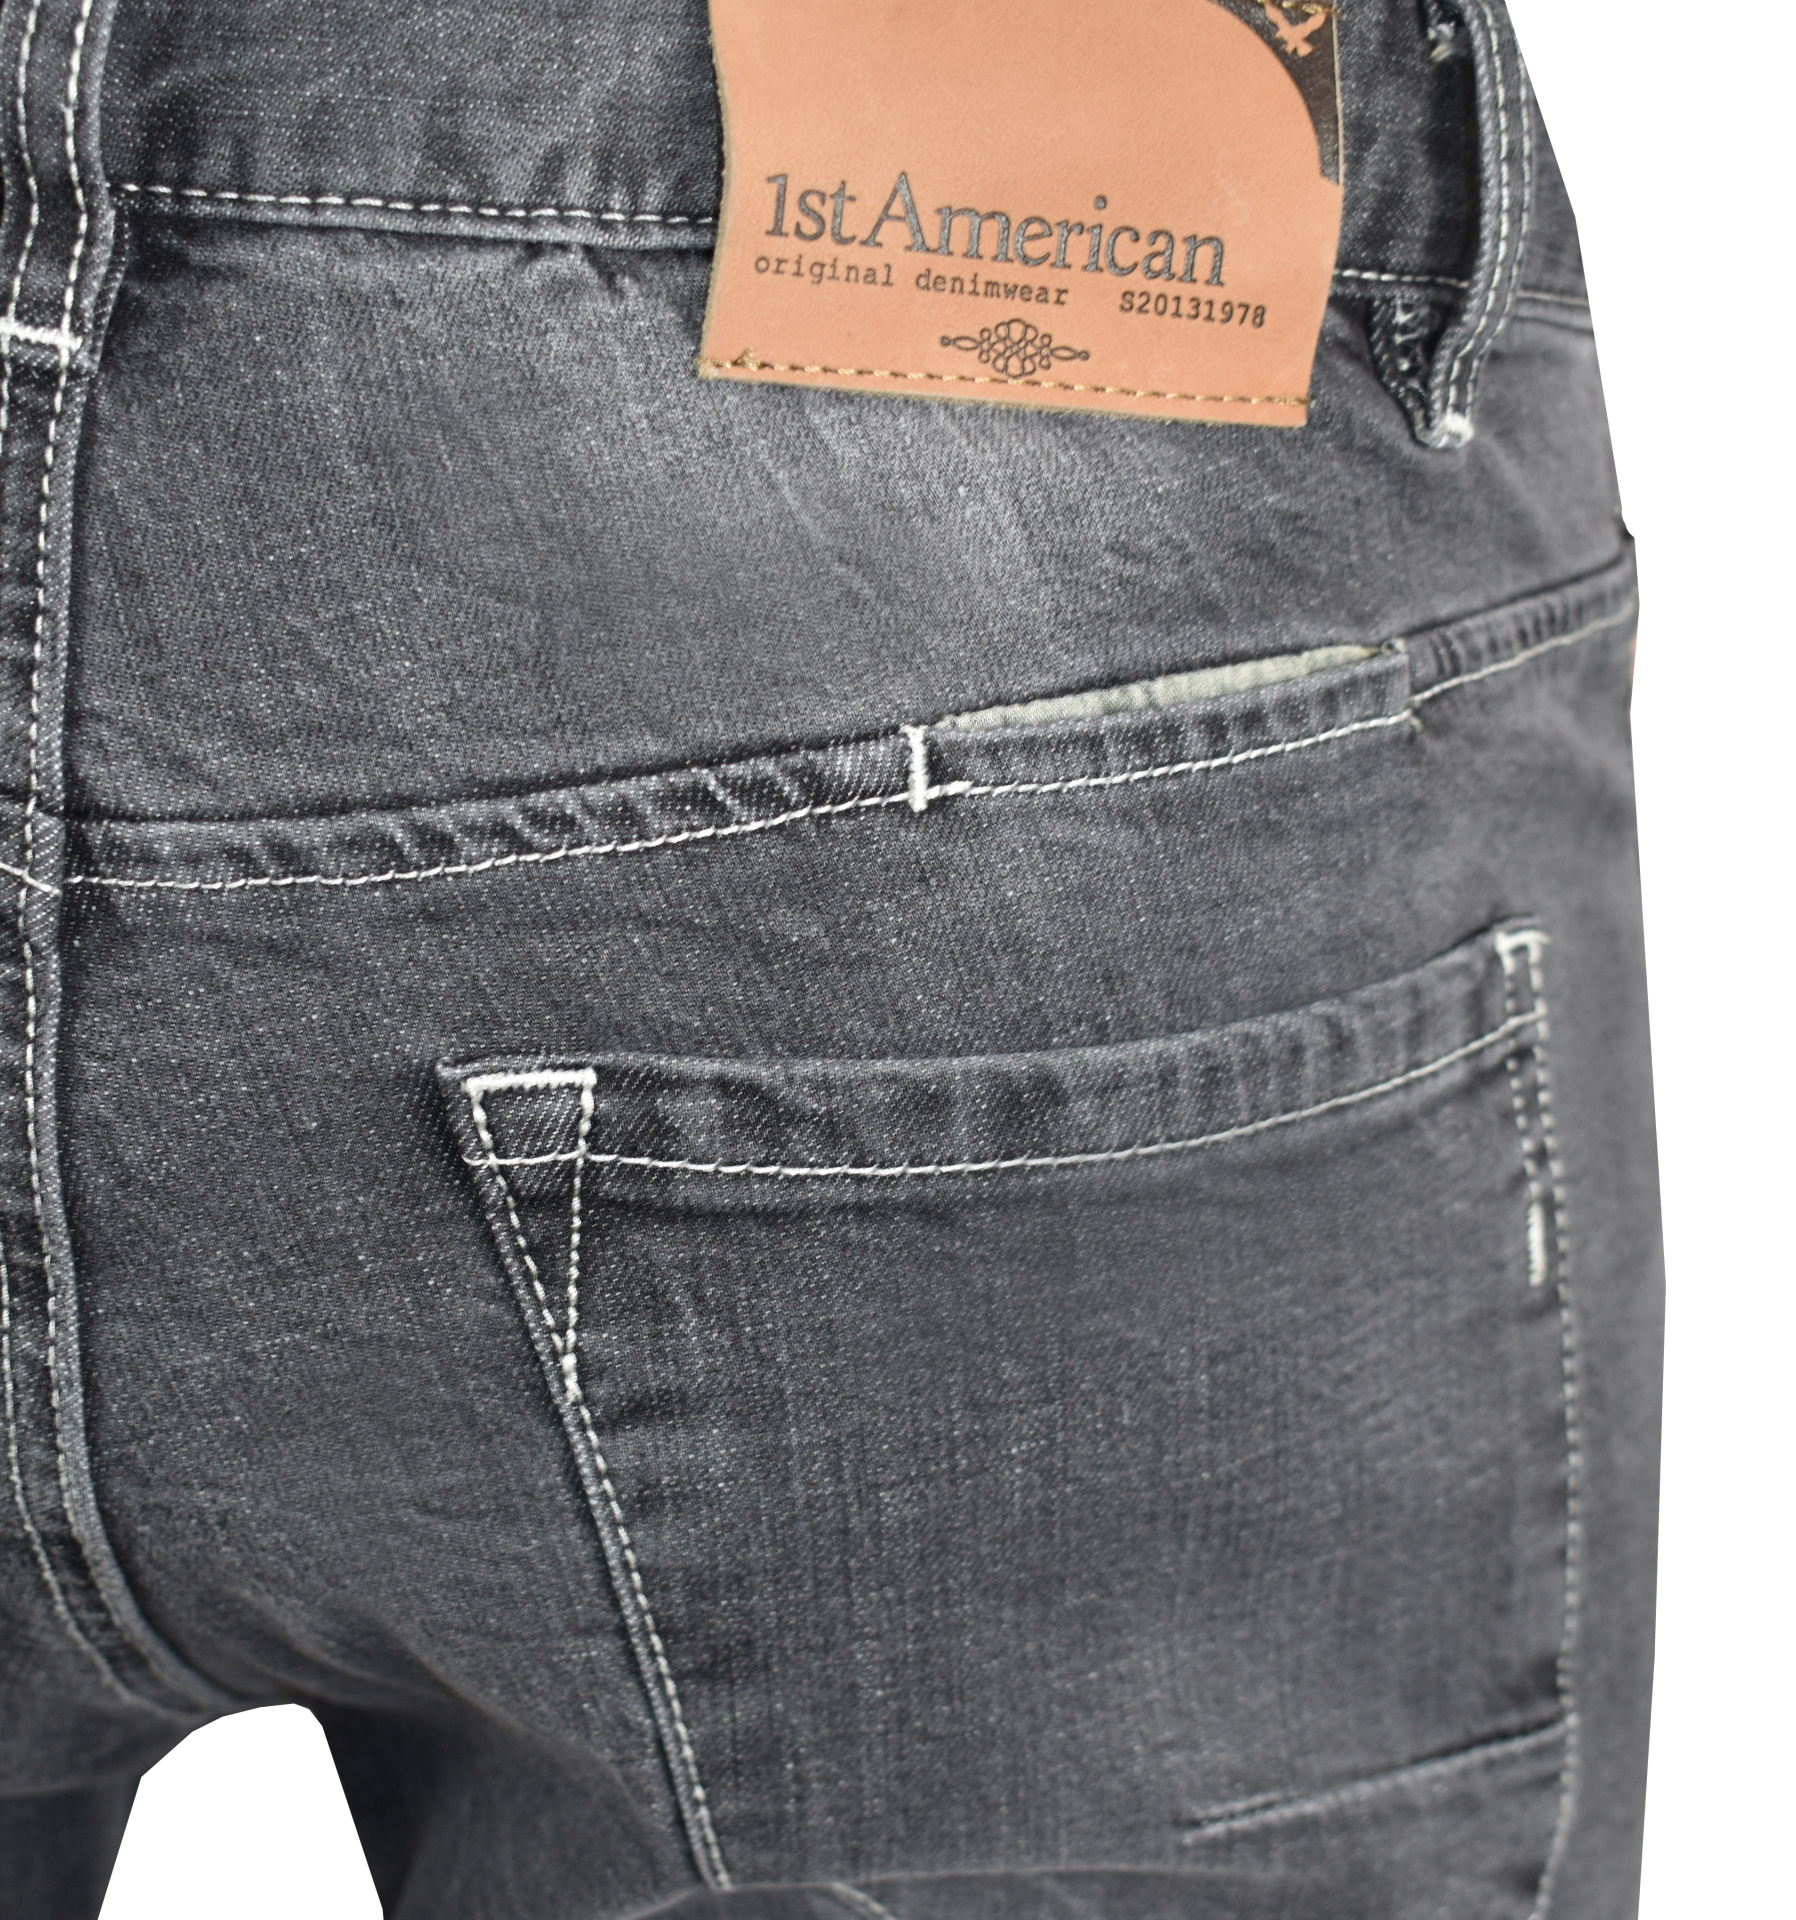 LEO JEANS UOMO 5 TASCHE GRIGIO CHIARO 4 1st american jeans fashion 5 tasche uomo colore grigio chiaro - 99% cotton 1% elastan denim 1150 oz